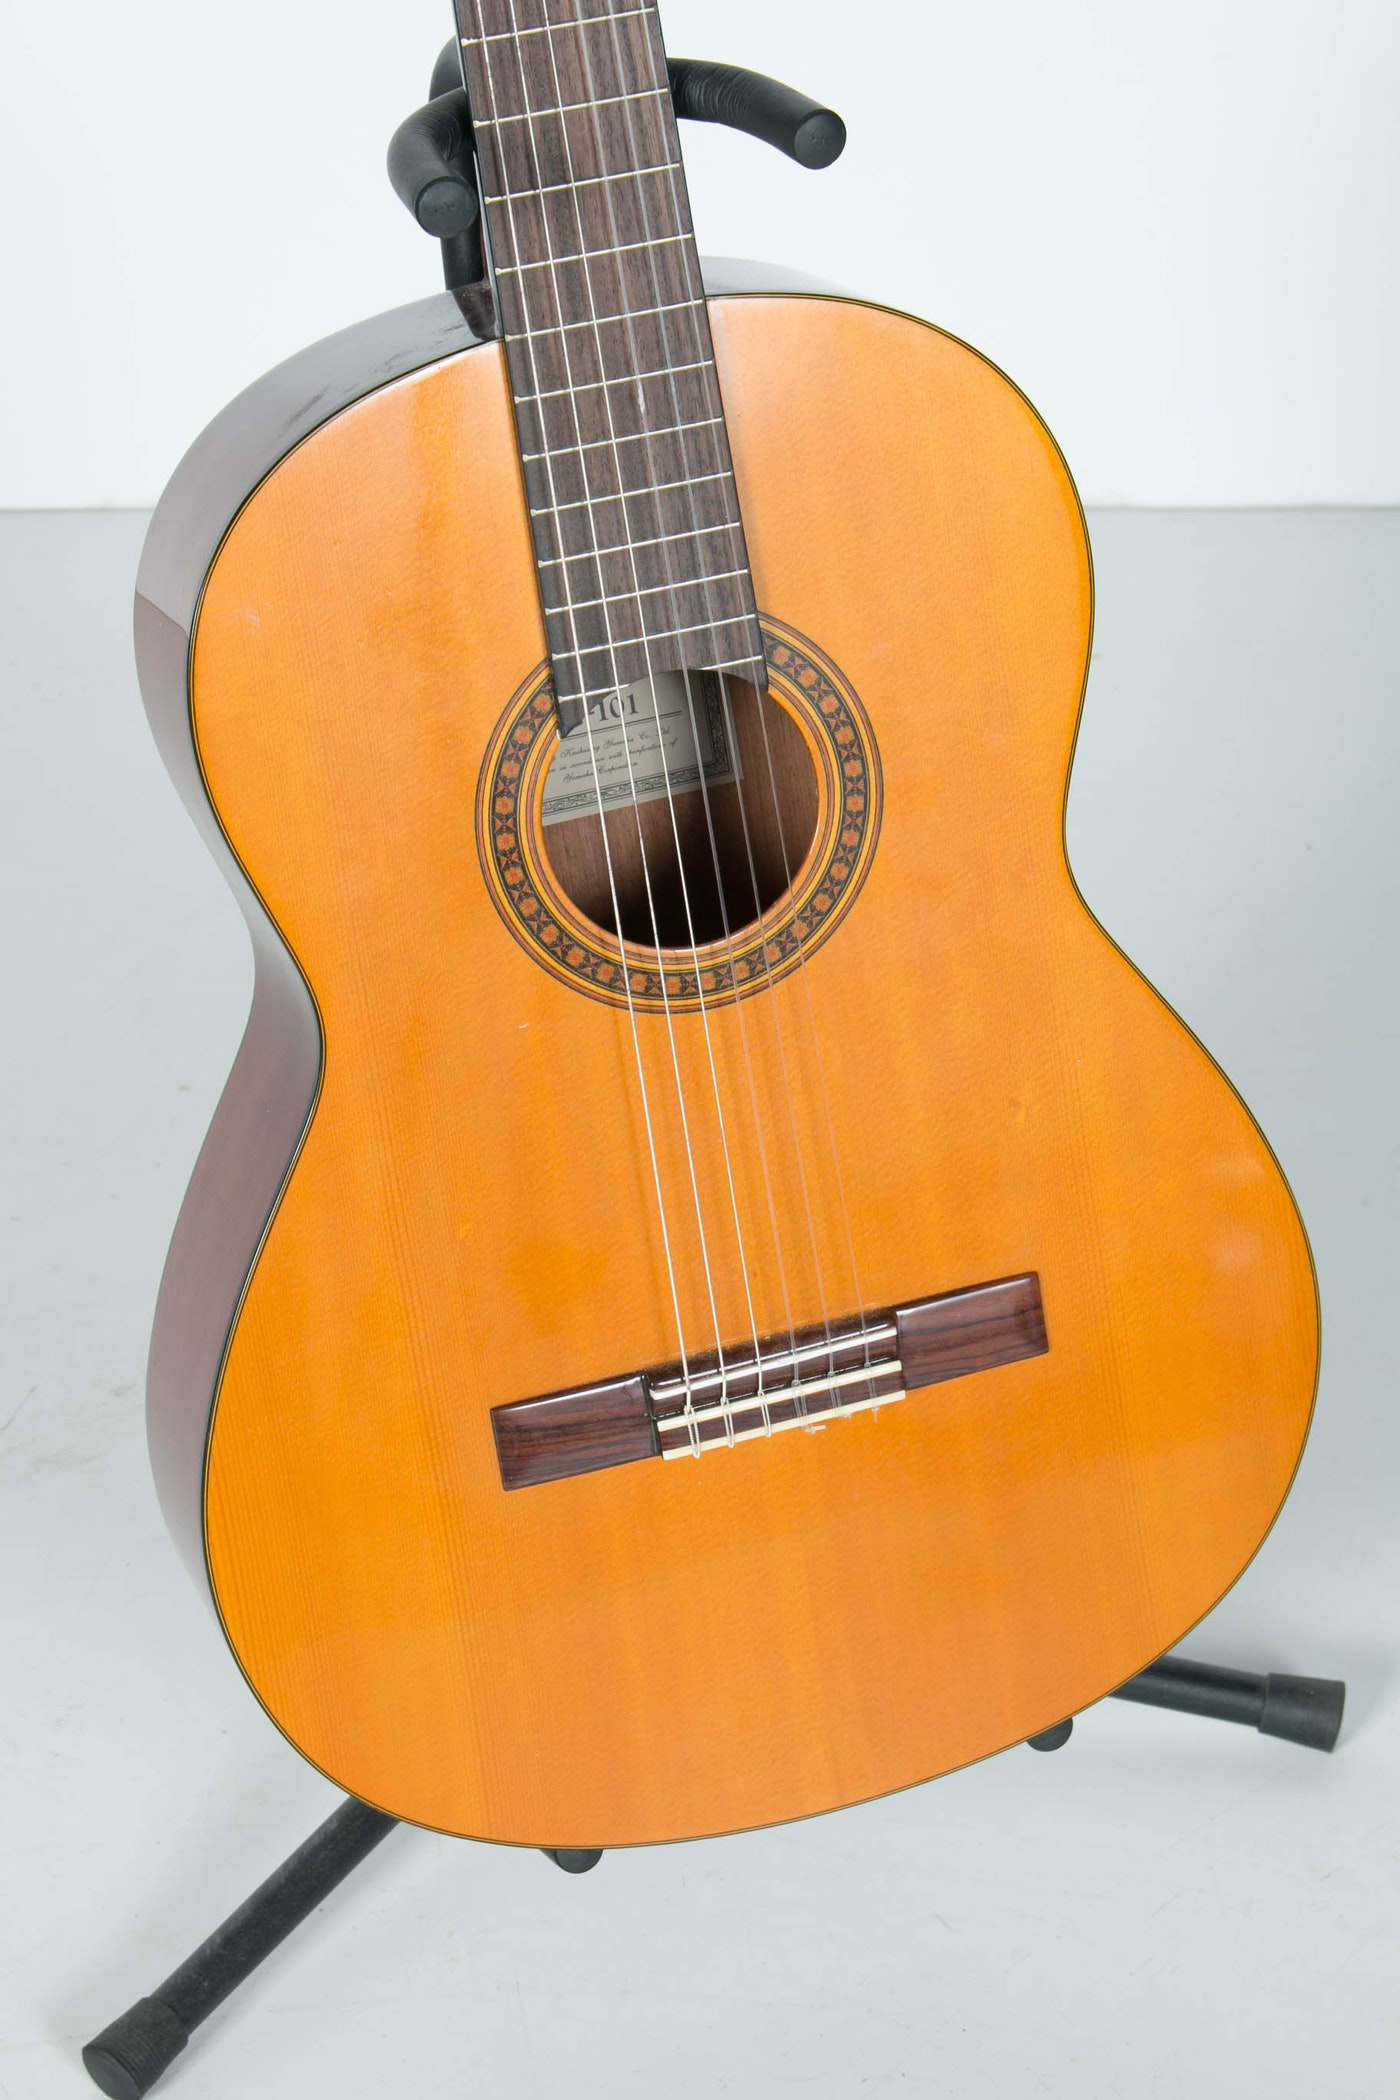 Yamaha Classical Guitar G A Tuning Pegs